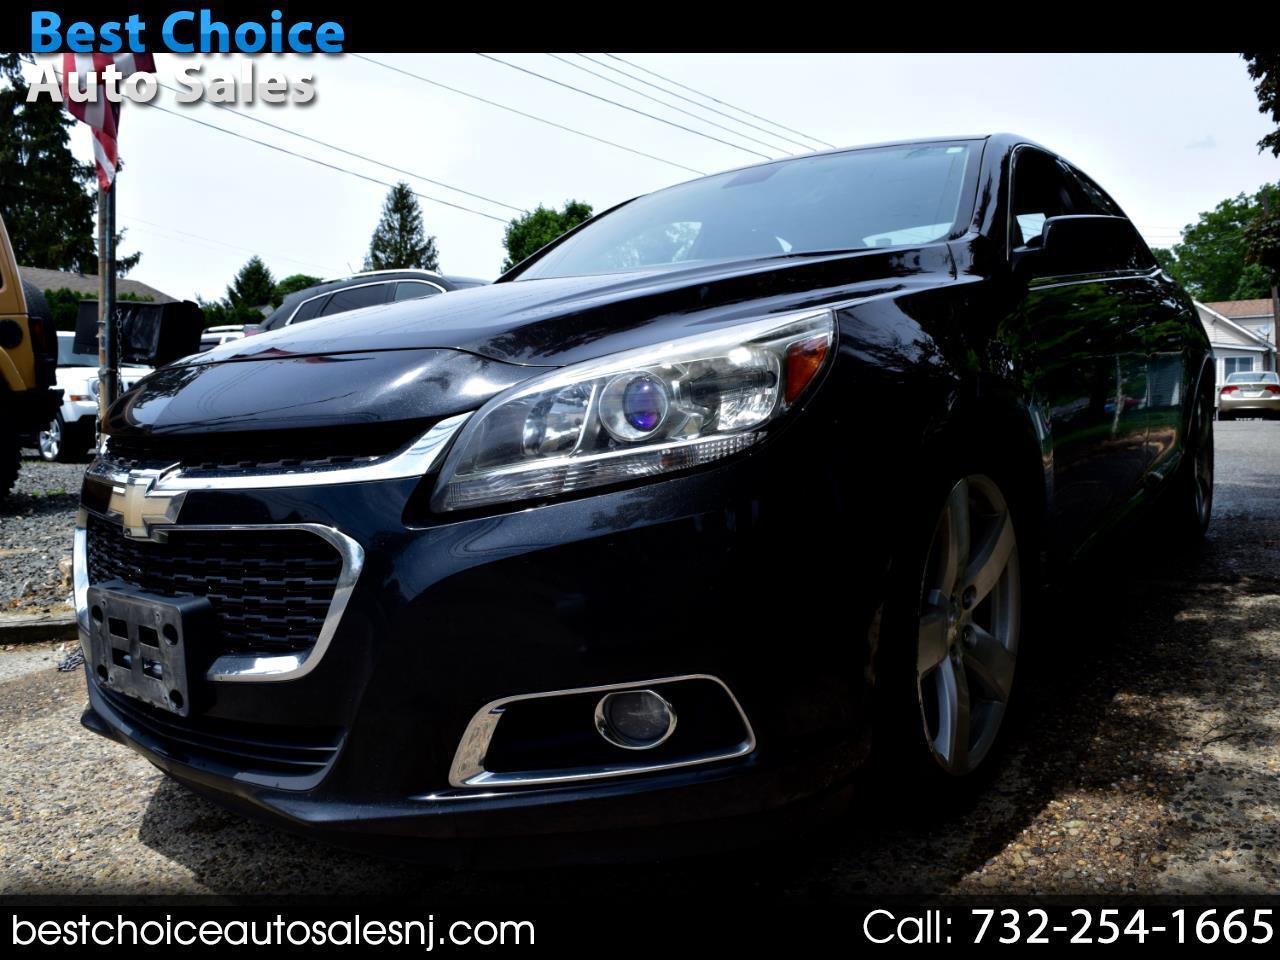 Chevrolet Malibu 4dr Sdn LTZ w/2LZ 2014